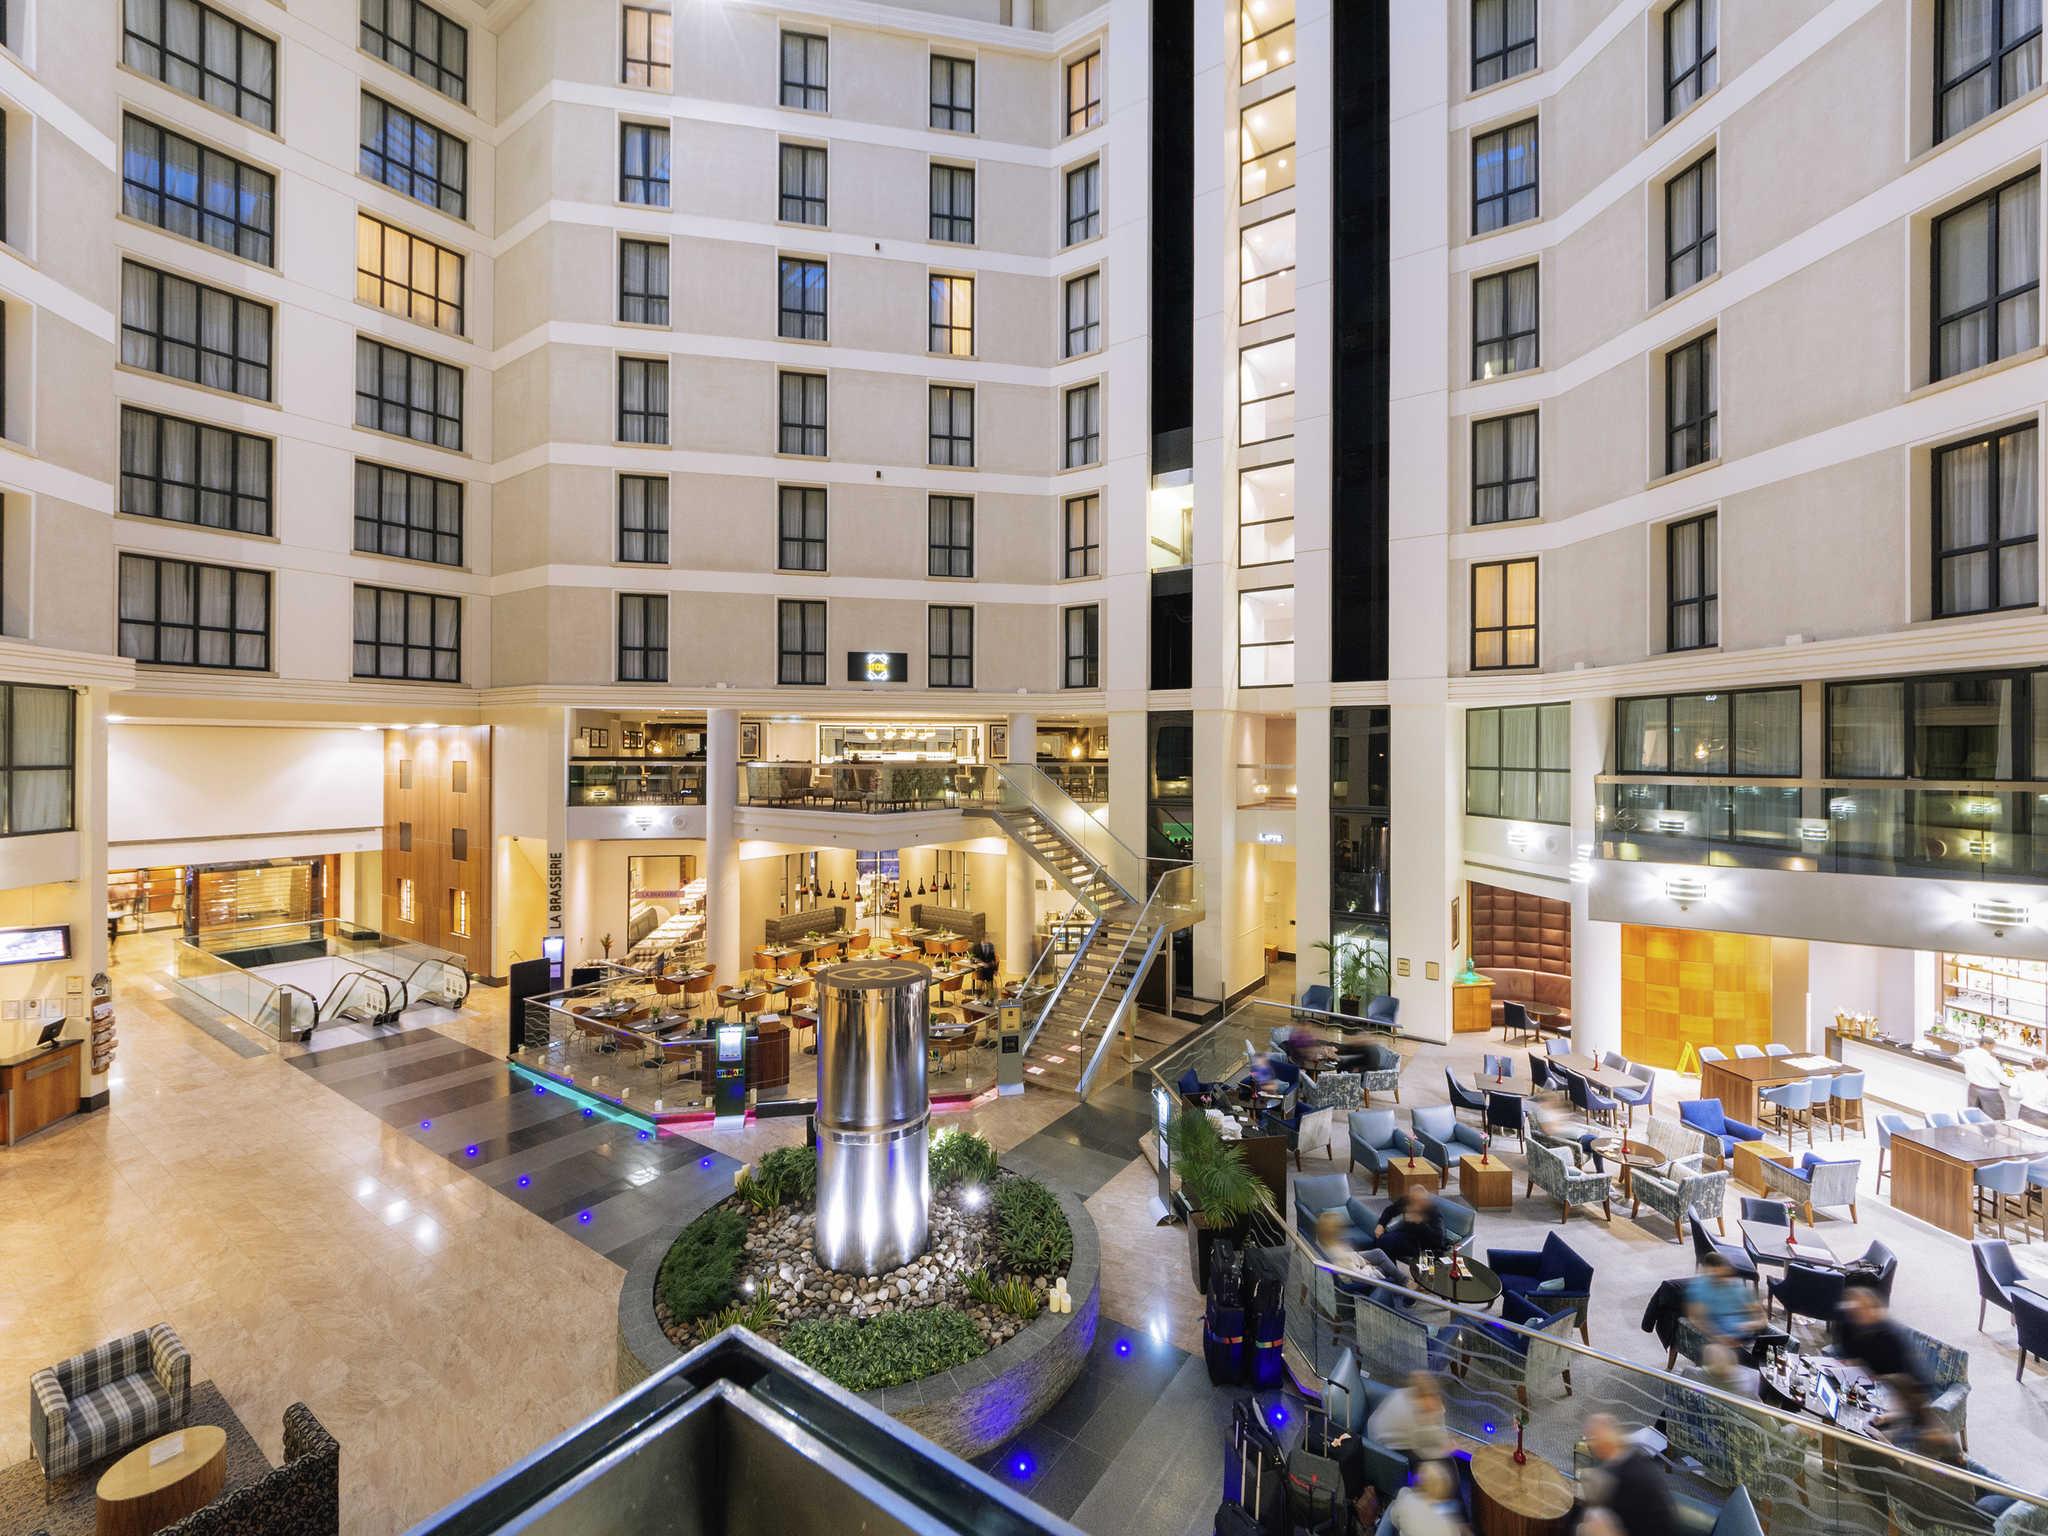 Sofitel London Gatwick 5 Star Hotel In Crawley